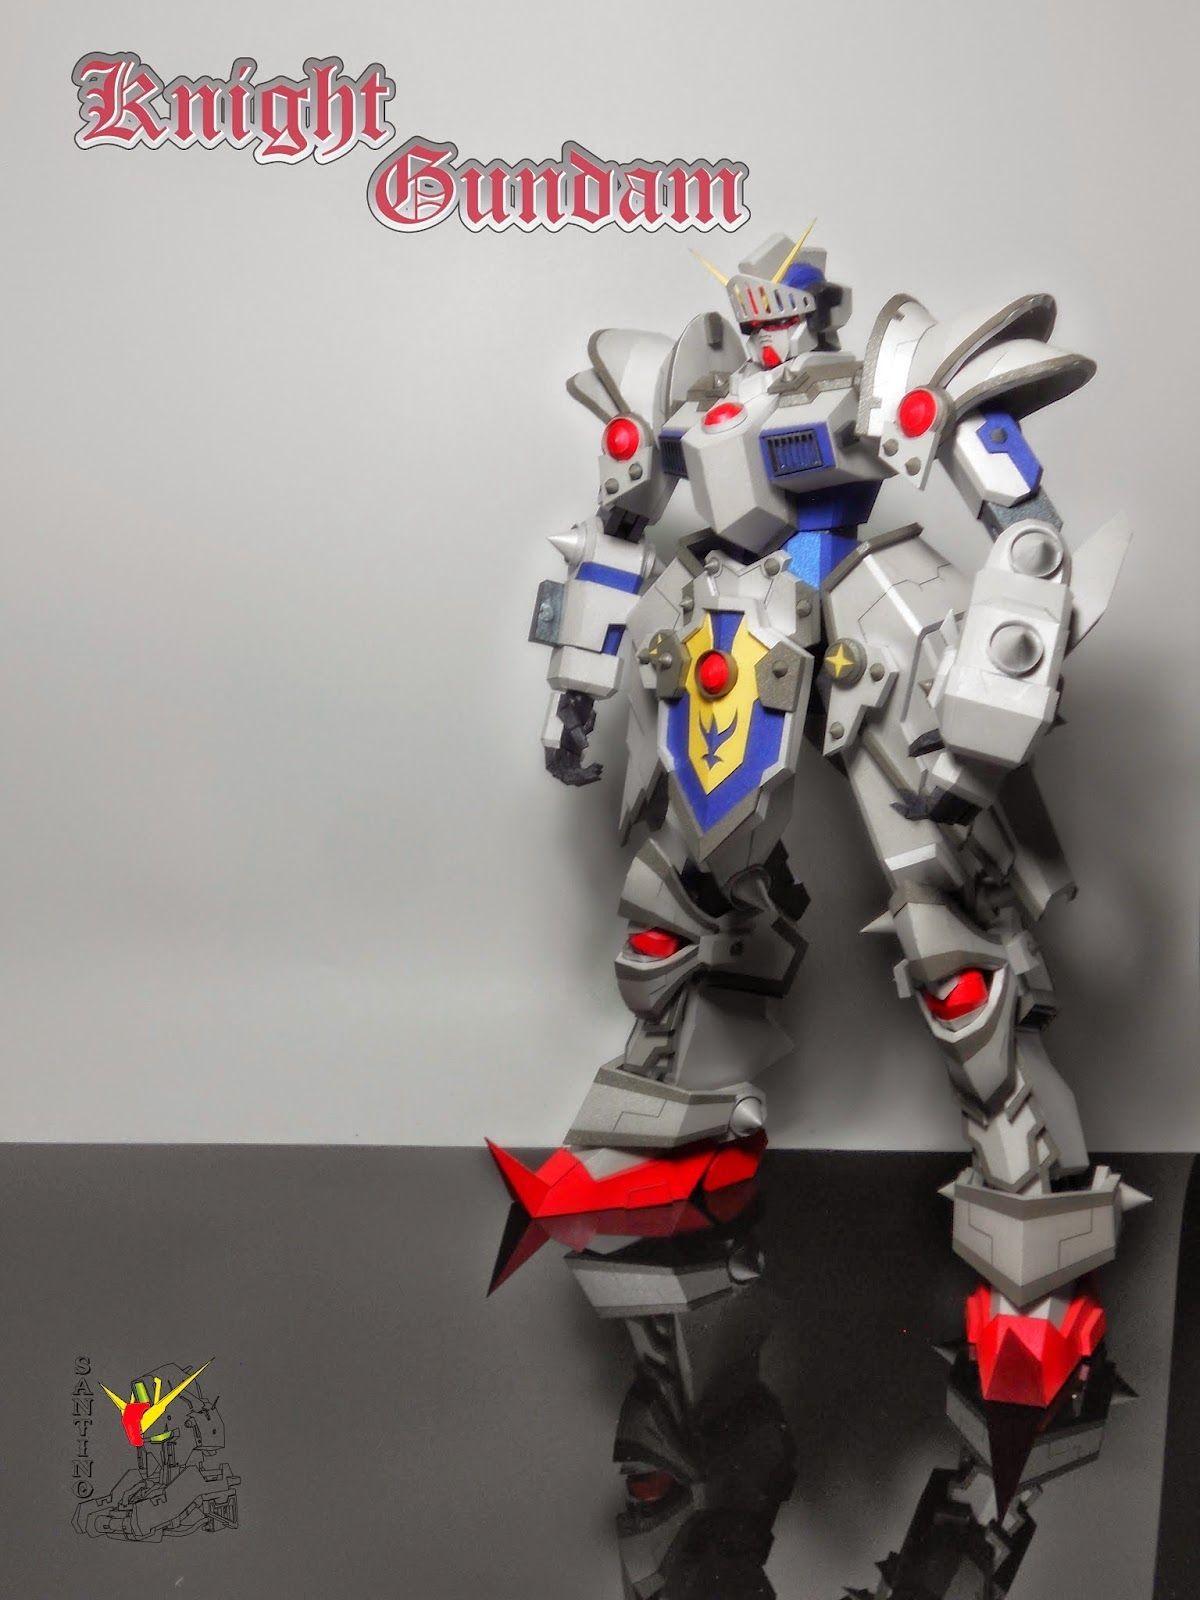 Papercraft Gundam Wn 01 Gundam Ver 2 Free Papercraft Download